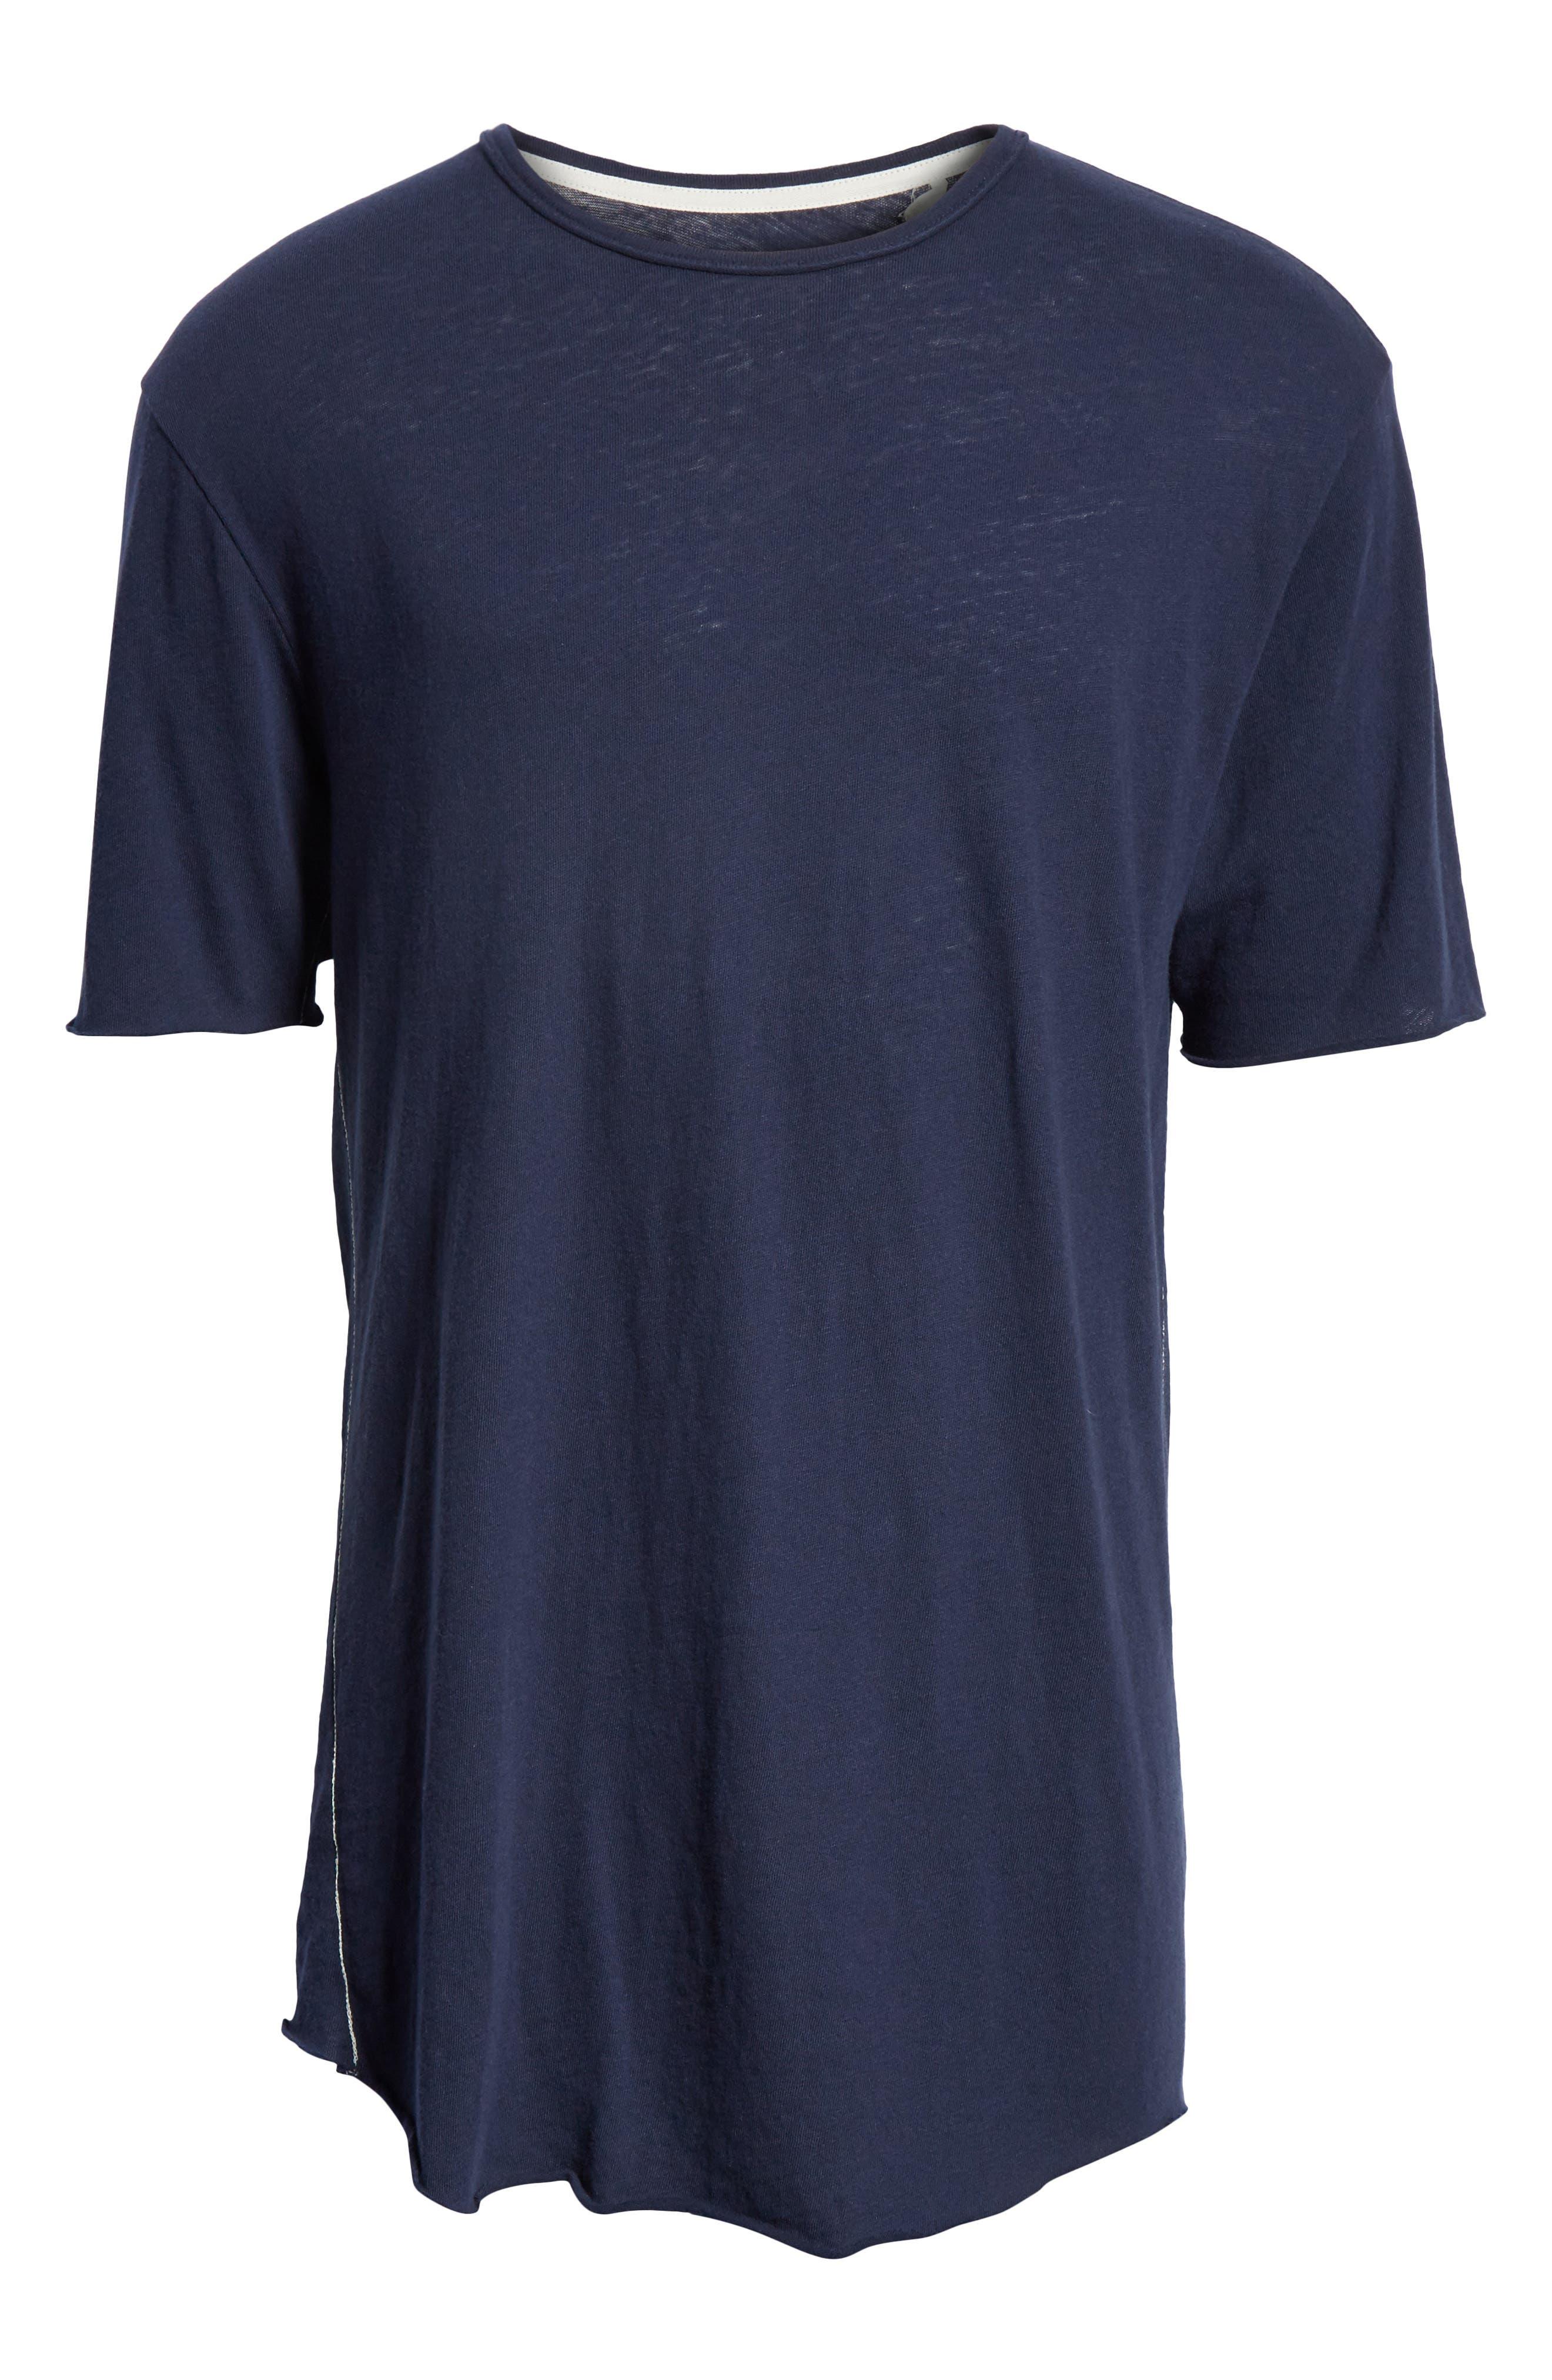 Hartley Crewneck Cotton & Linen T-Shirt,                             Alternate thumbnail 6, color,                             Navy